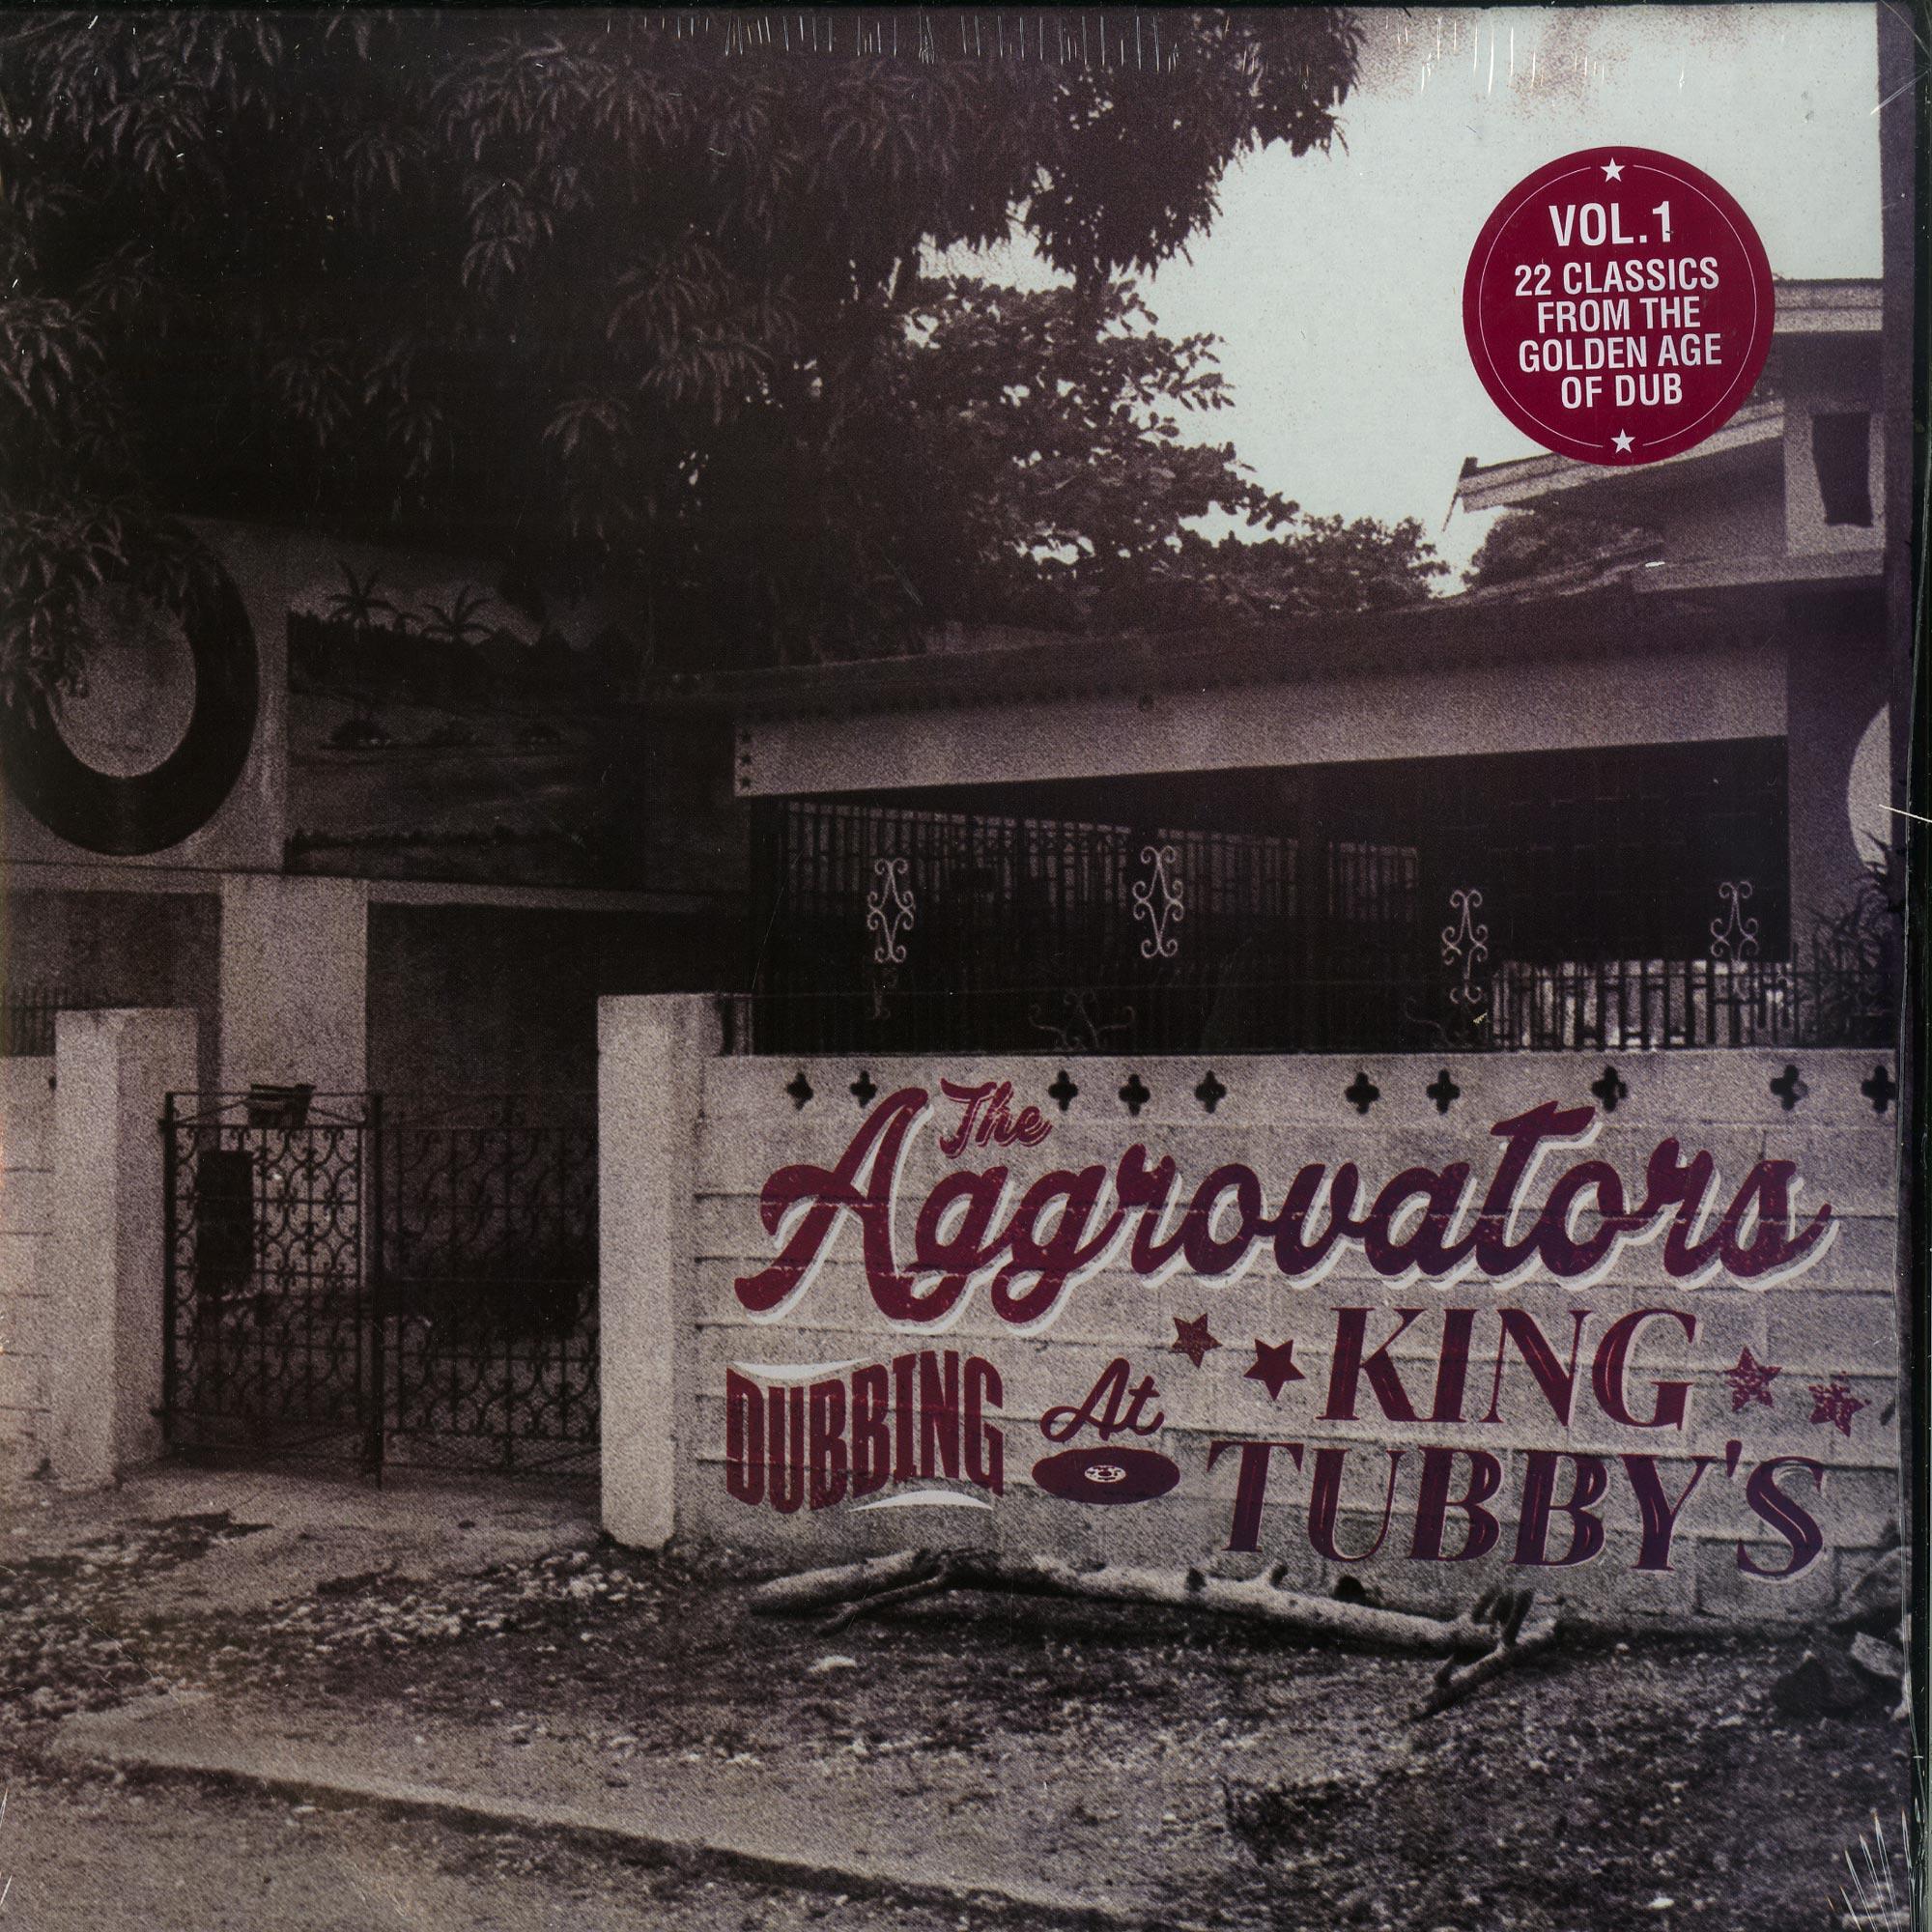 Aggrovators - DUBBING AT KING TUBBYS VOL. 1